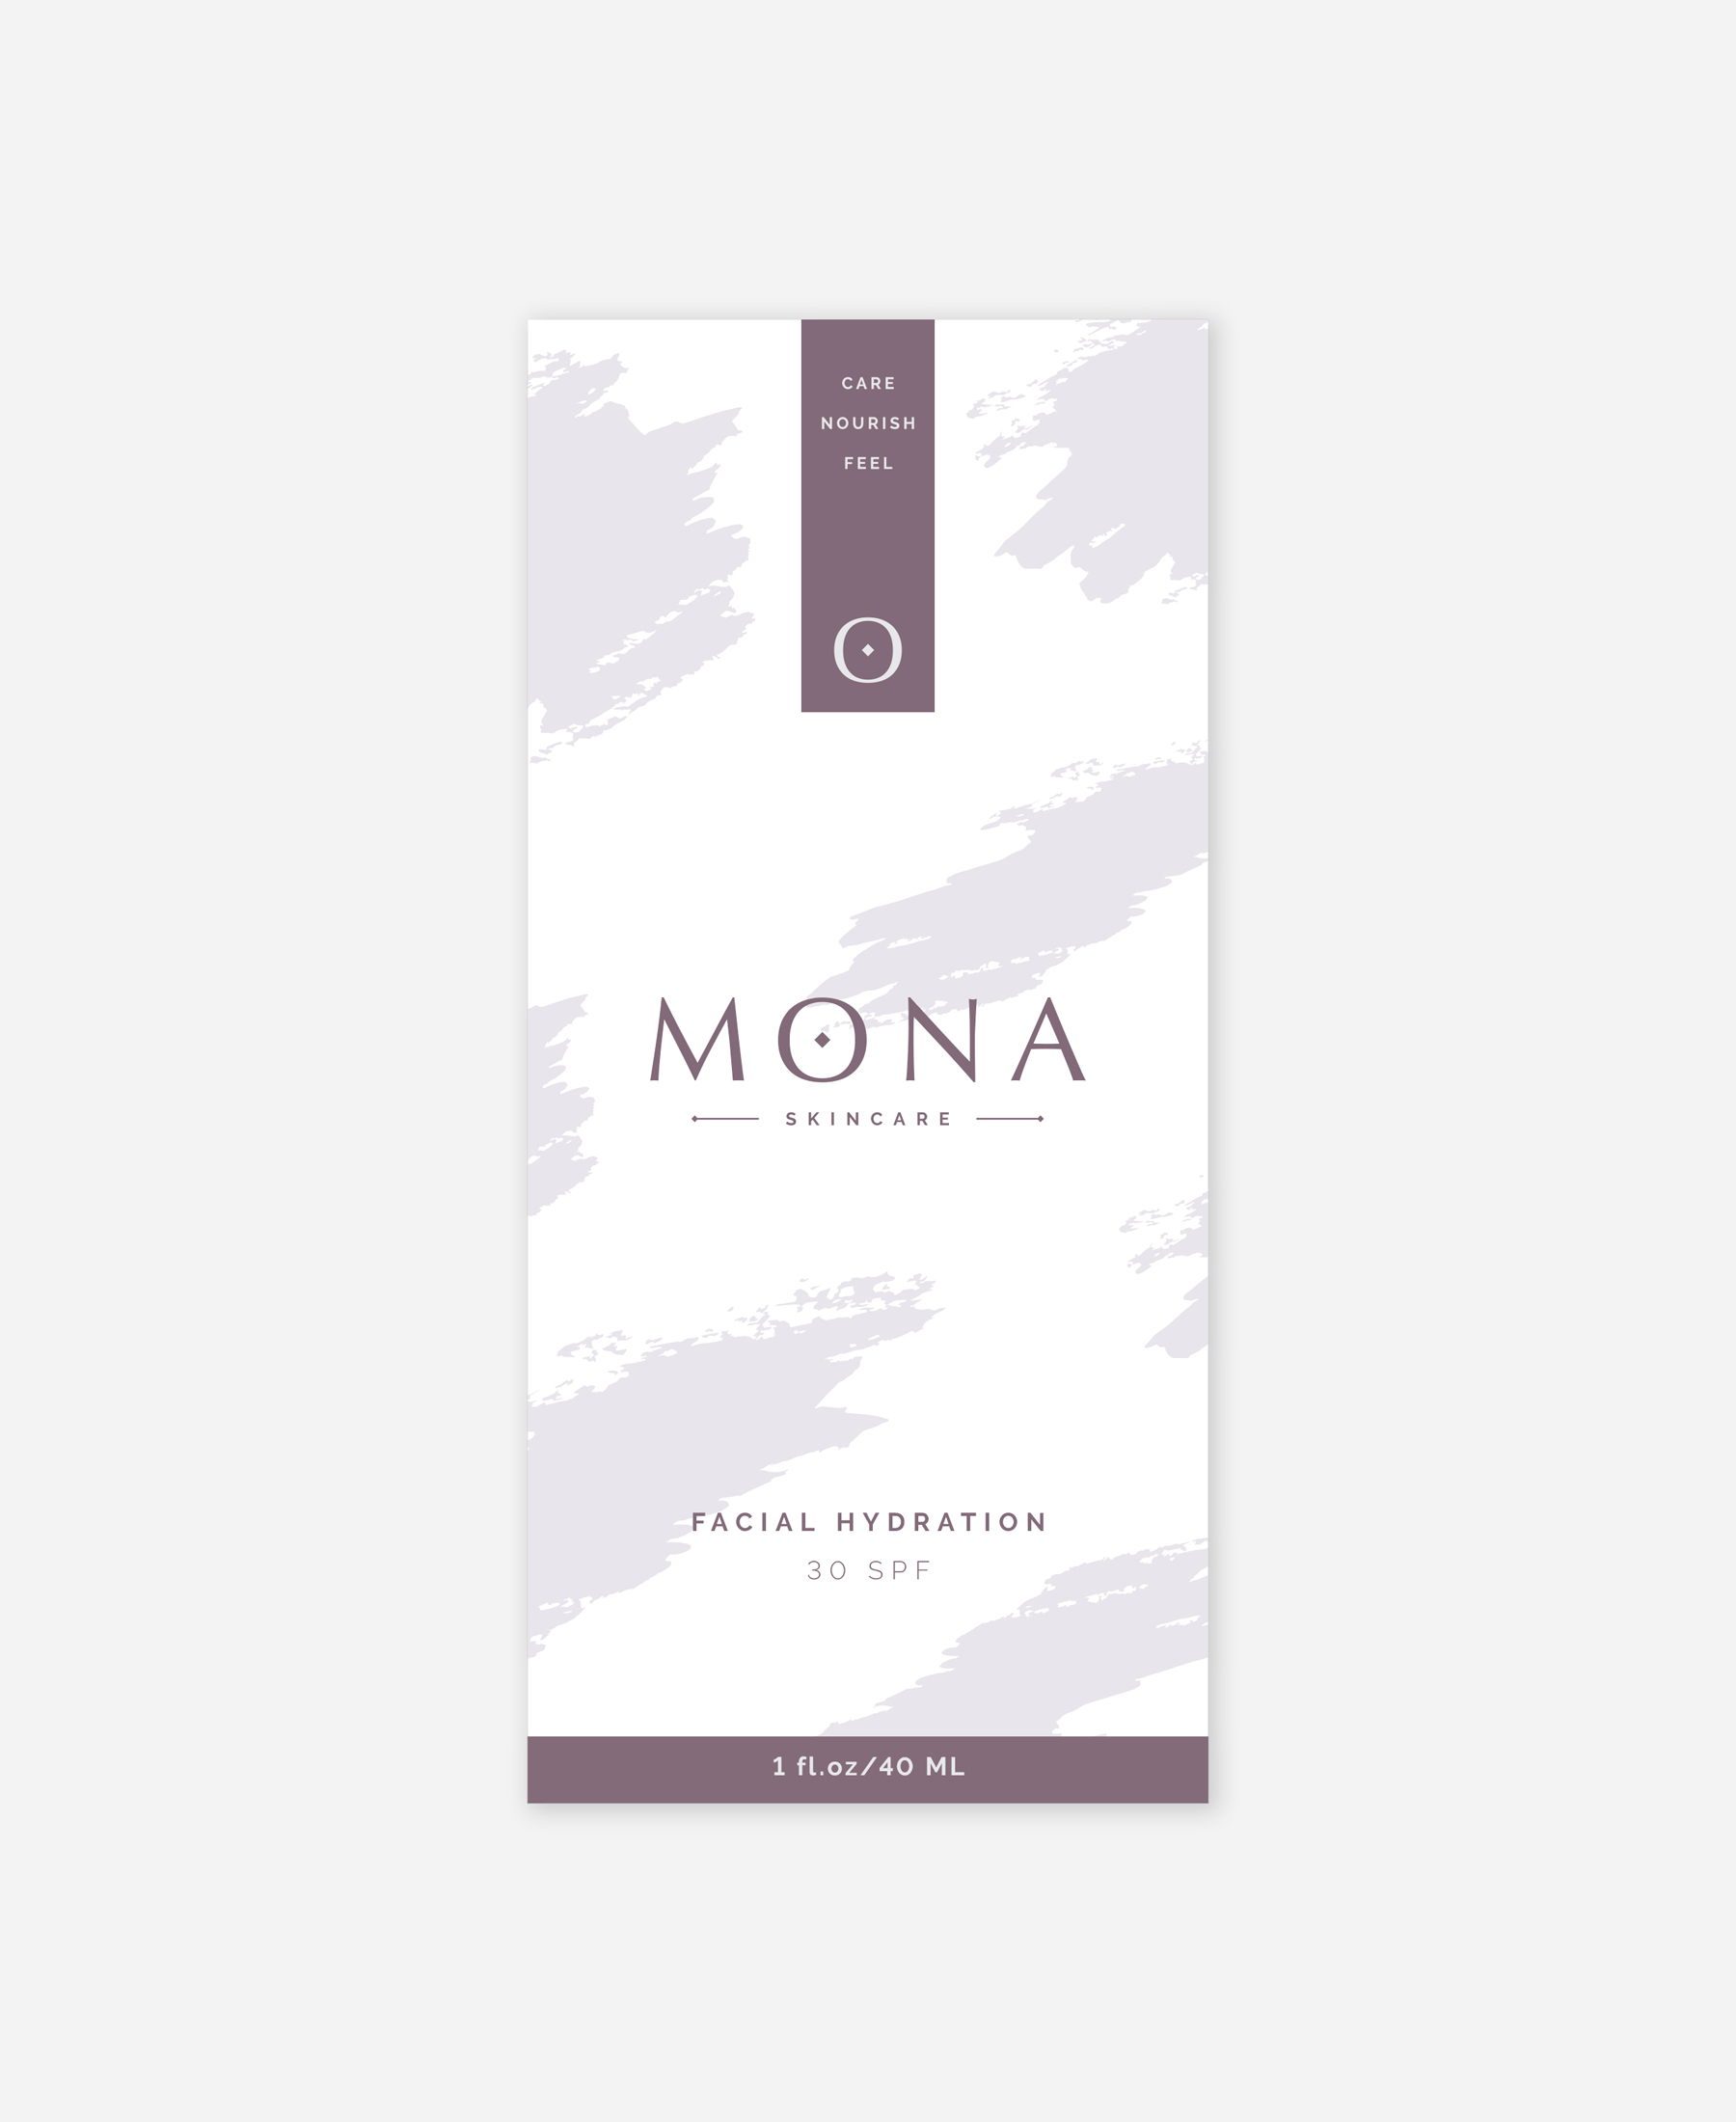 Mona_AmysAtelier_Brand_Packaging_Design_Vienna.jpg